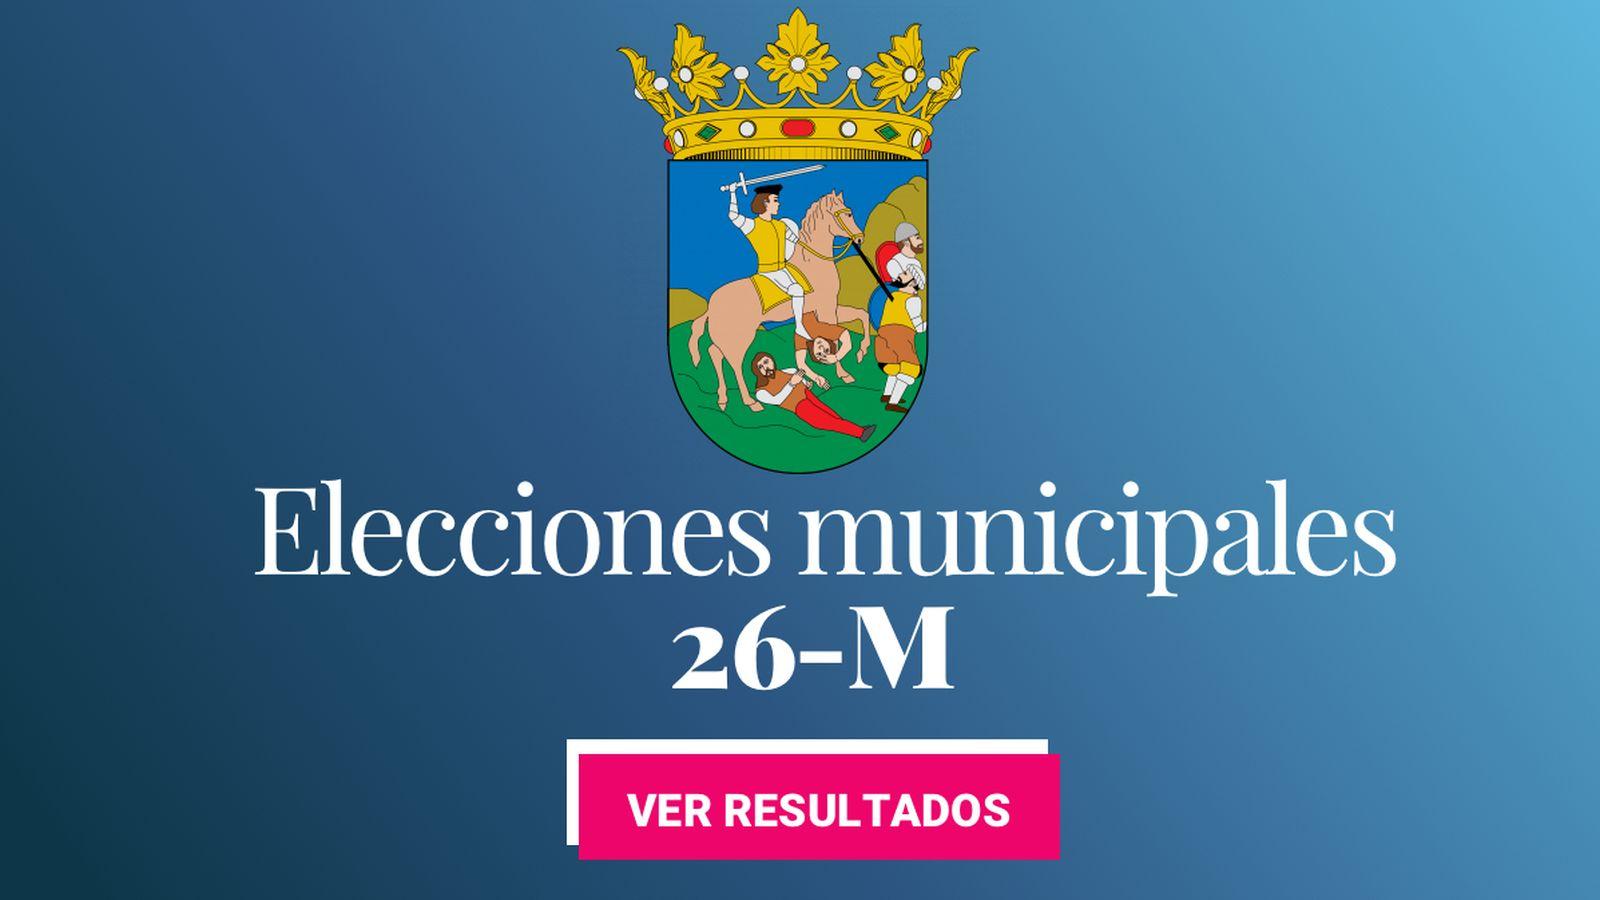 Foto: Elecciones municipales 2019 en Vélez-Málaga. (C.C./EC)